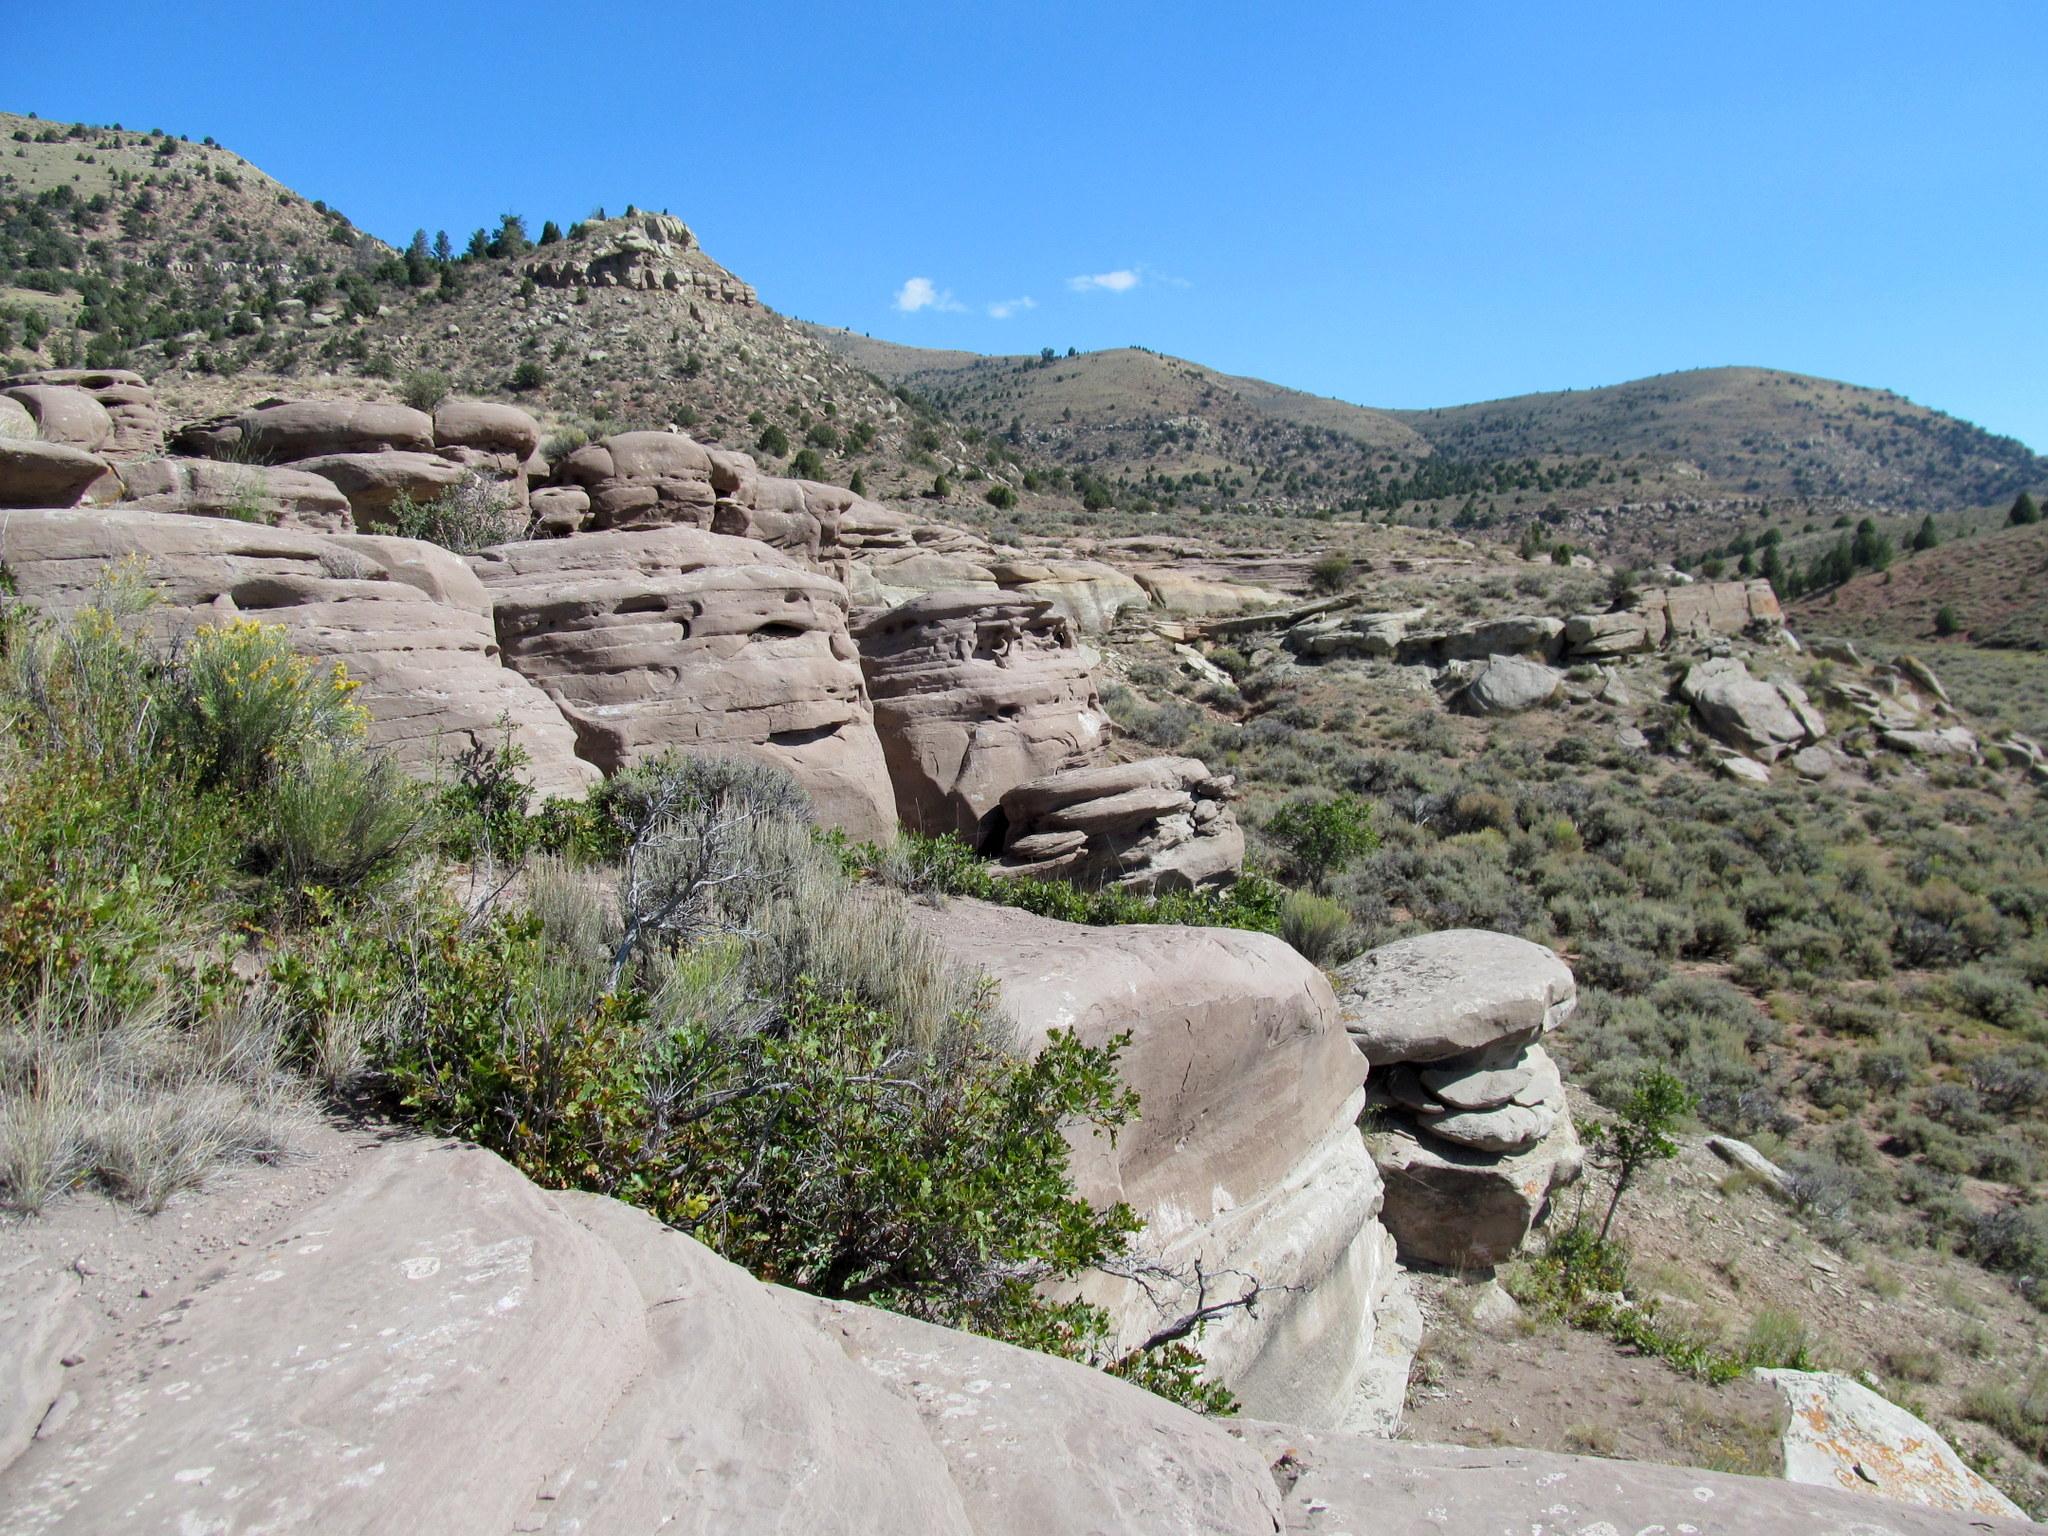 Photo: Sandstone ledges near the rock art